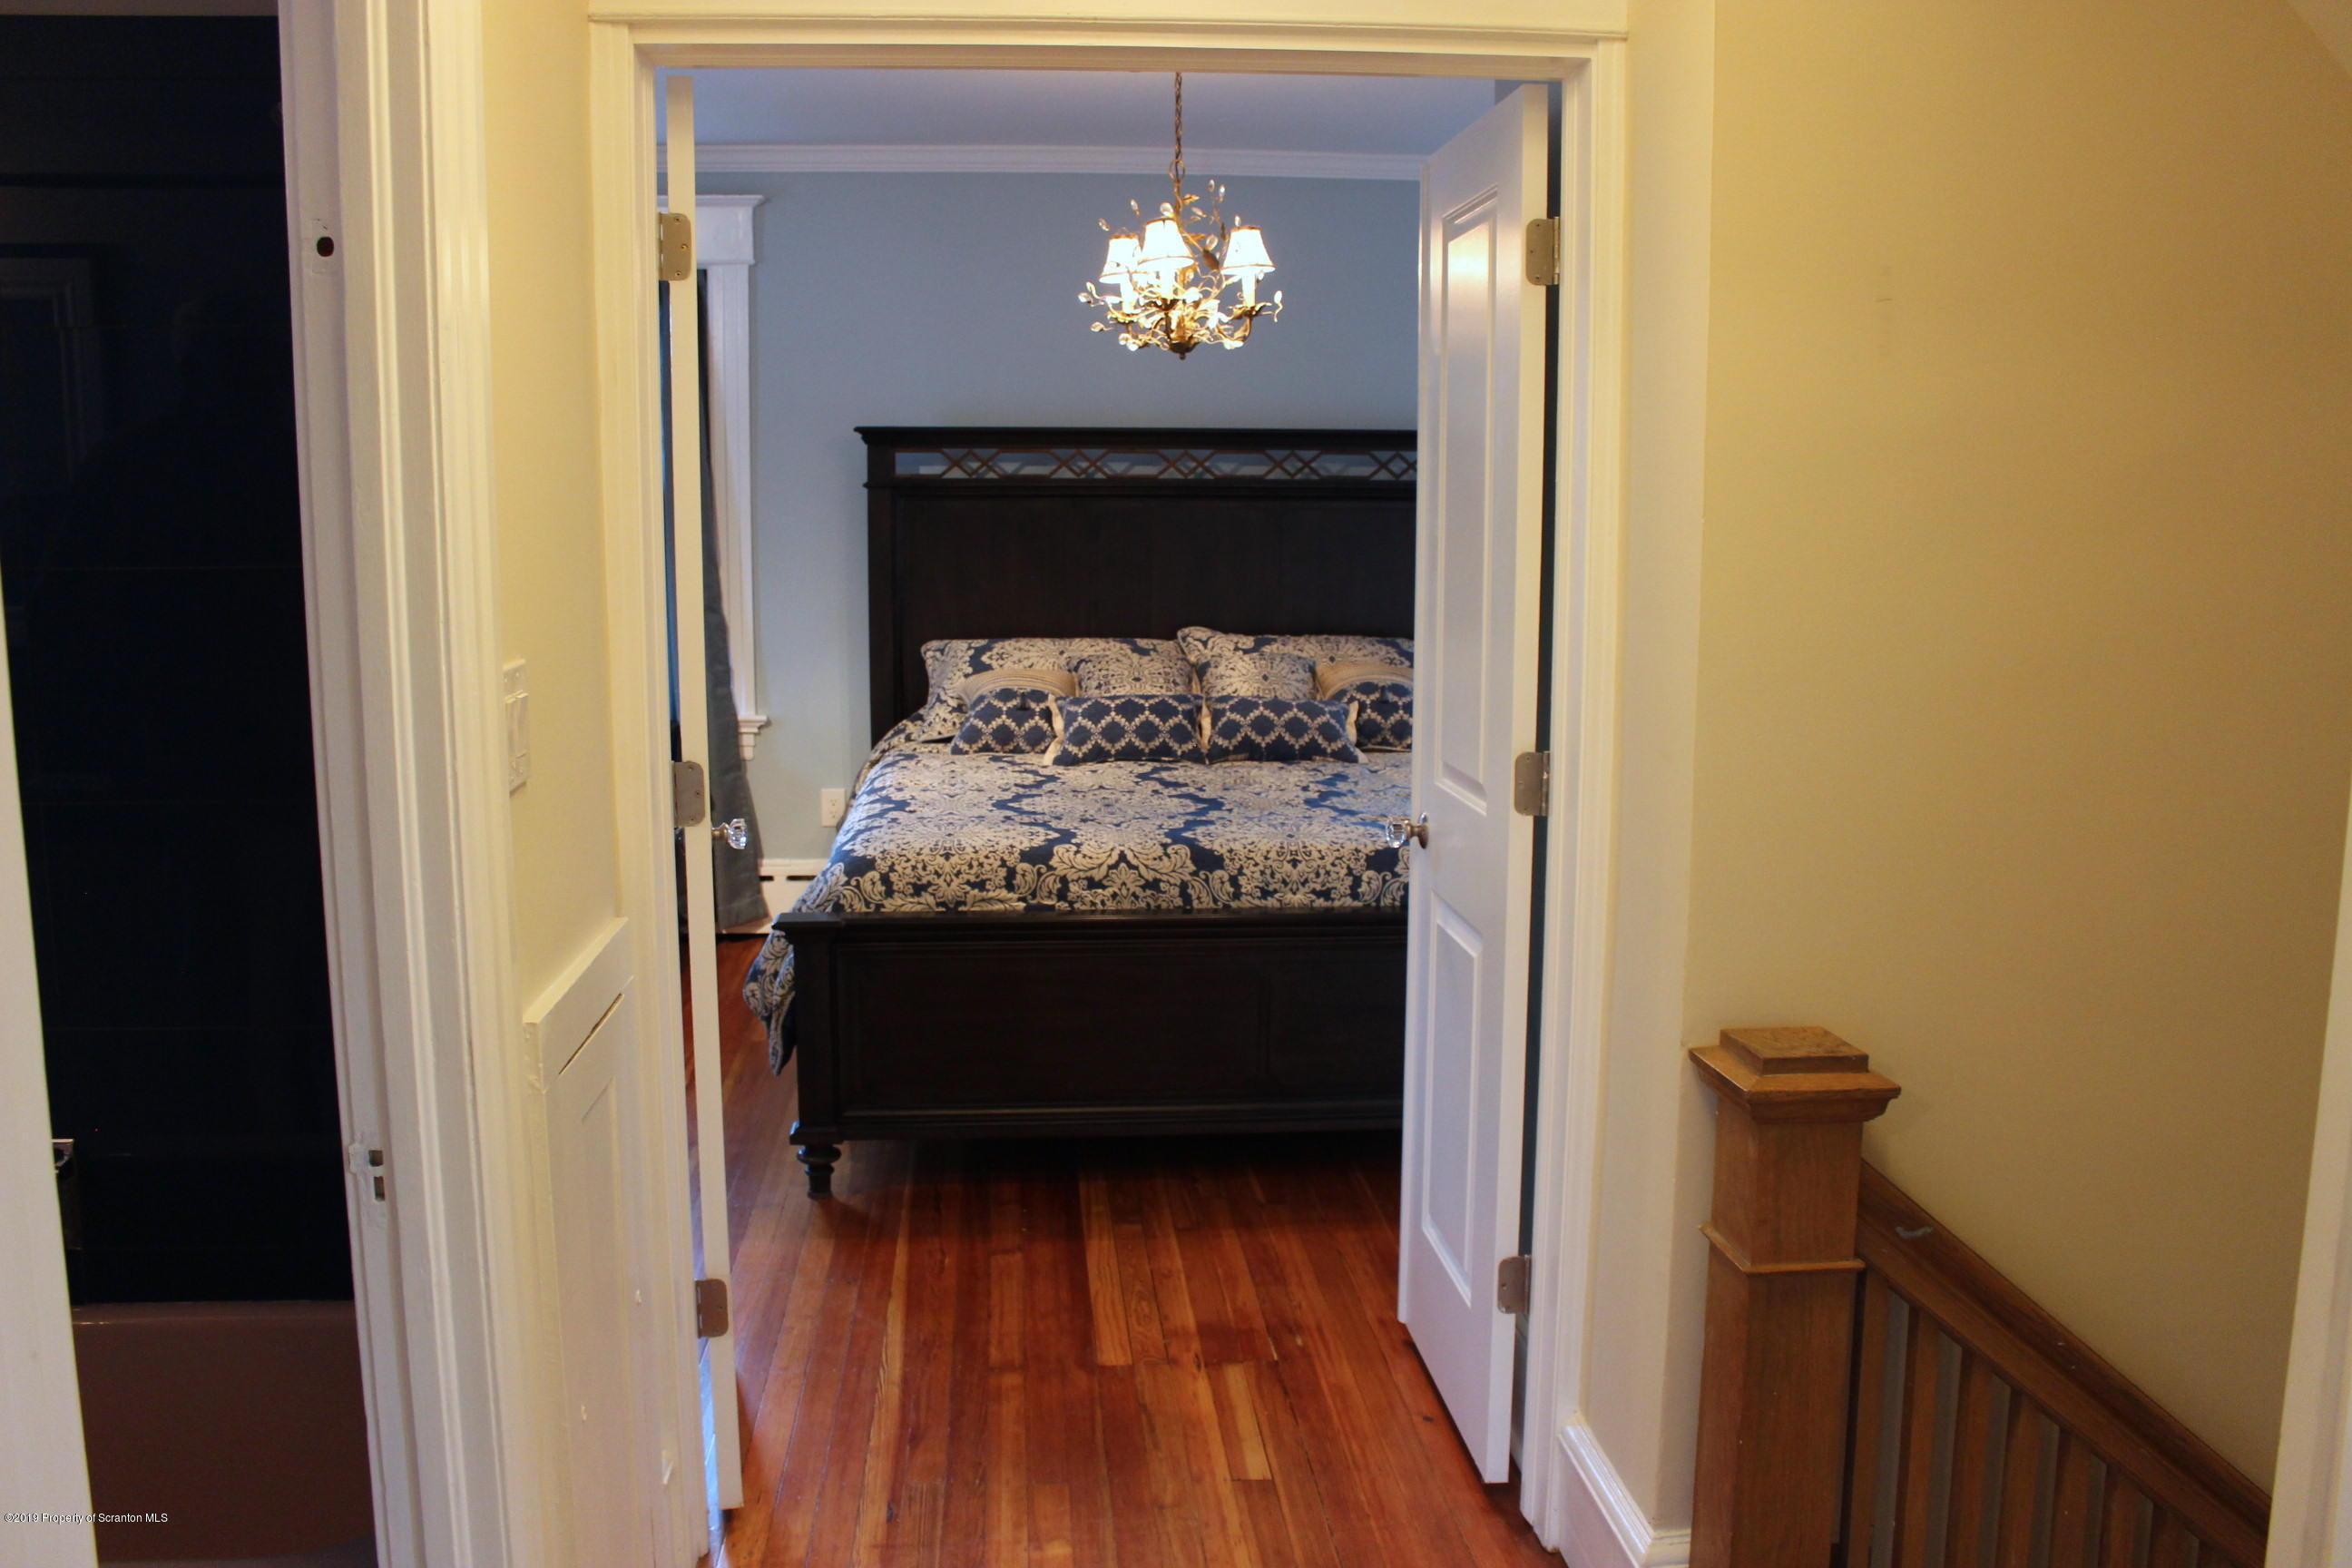 1729 Wyoming Ave, Scranton, Pennsylvania 18509, 4 Bedrooms Bedrooms, 7 Rooms Rooms,4 BathroomsBathrooms,Single Family,For Sale,Wyoming,19-1155